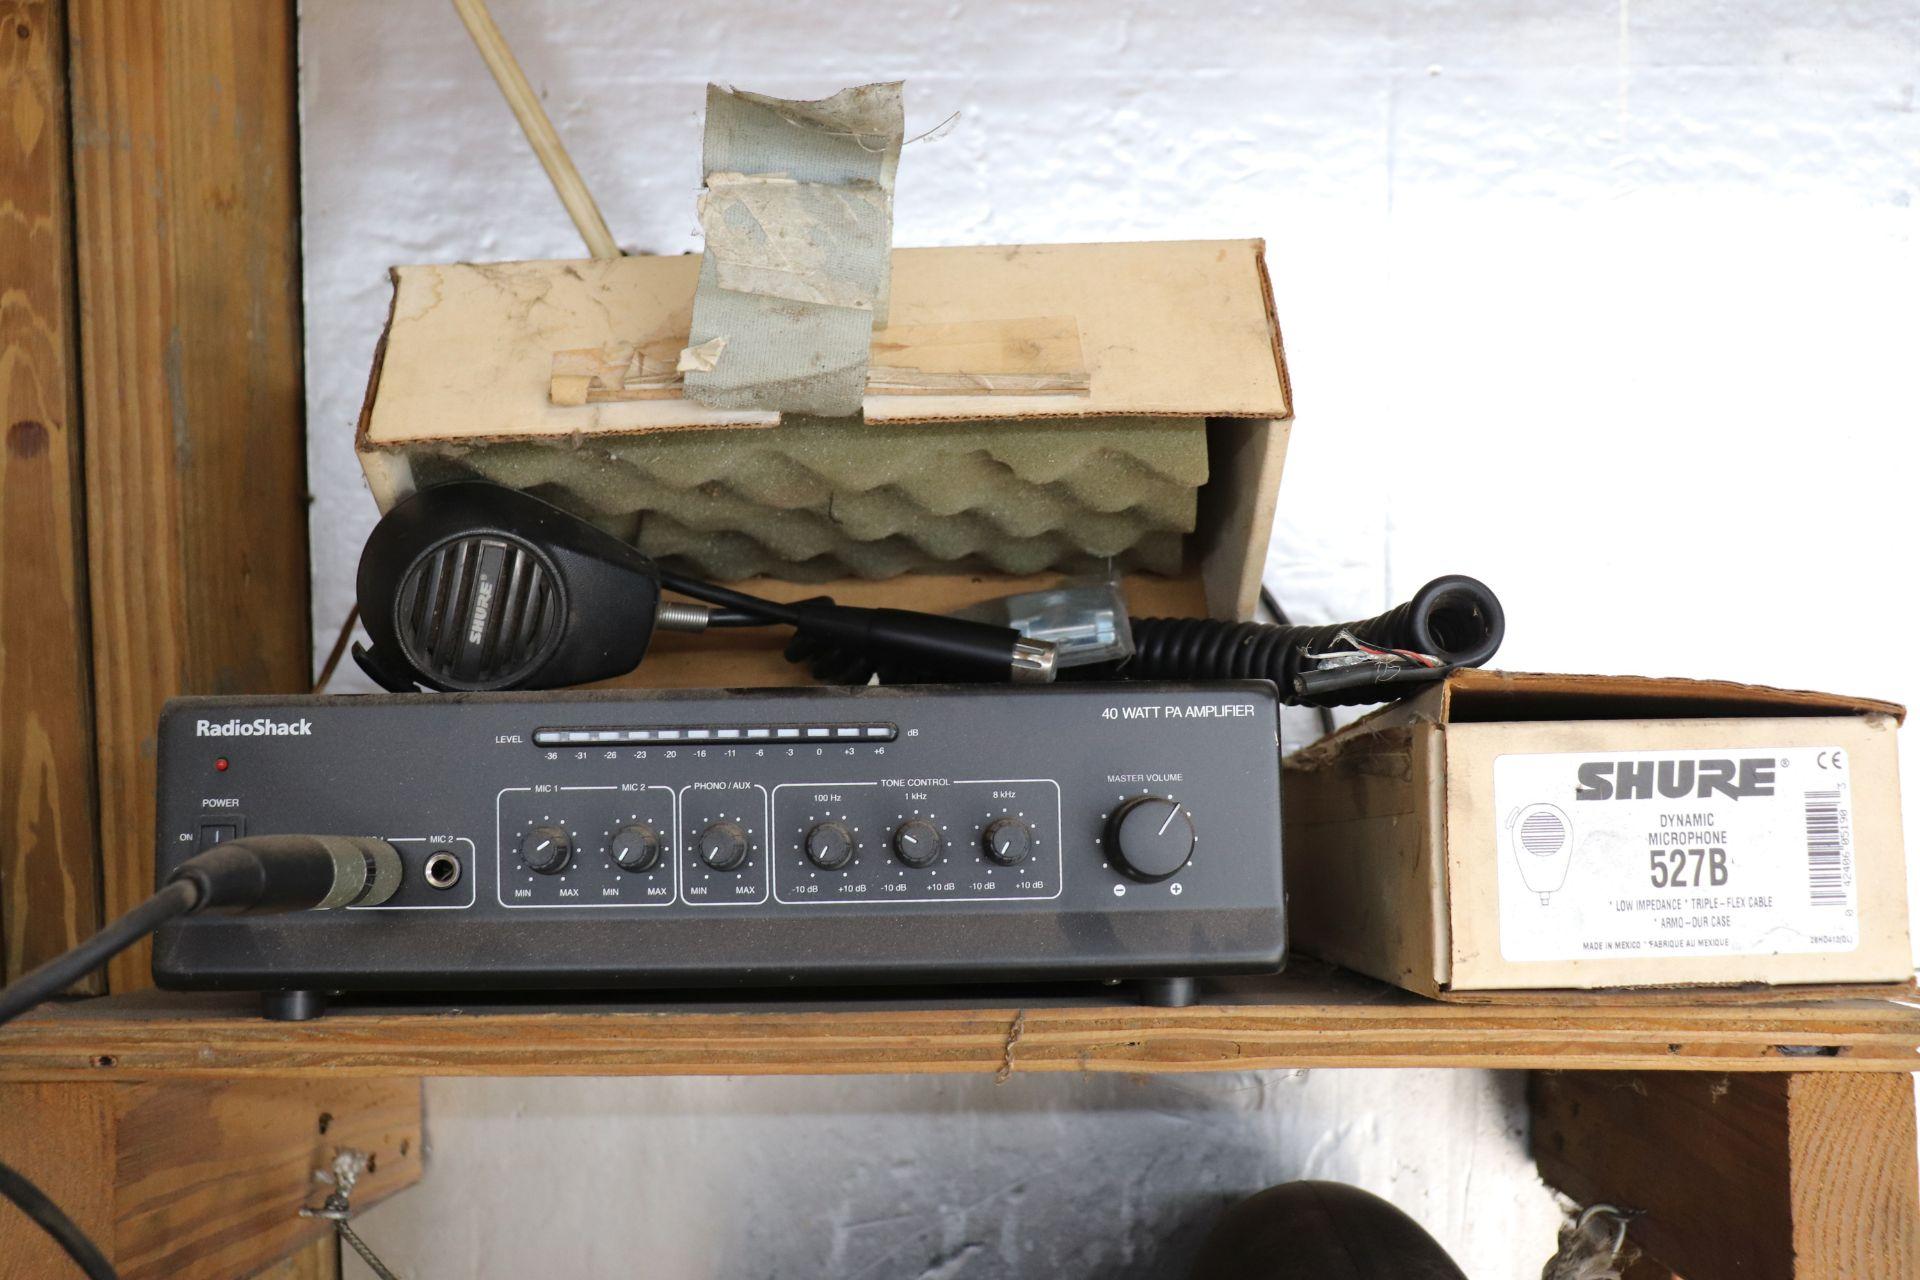 Radio Shack brand 40-watt PA amplifier and two Shure microphones